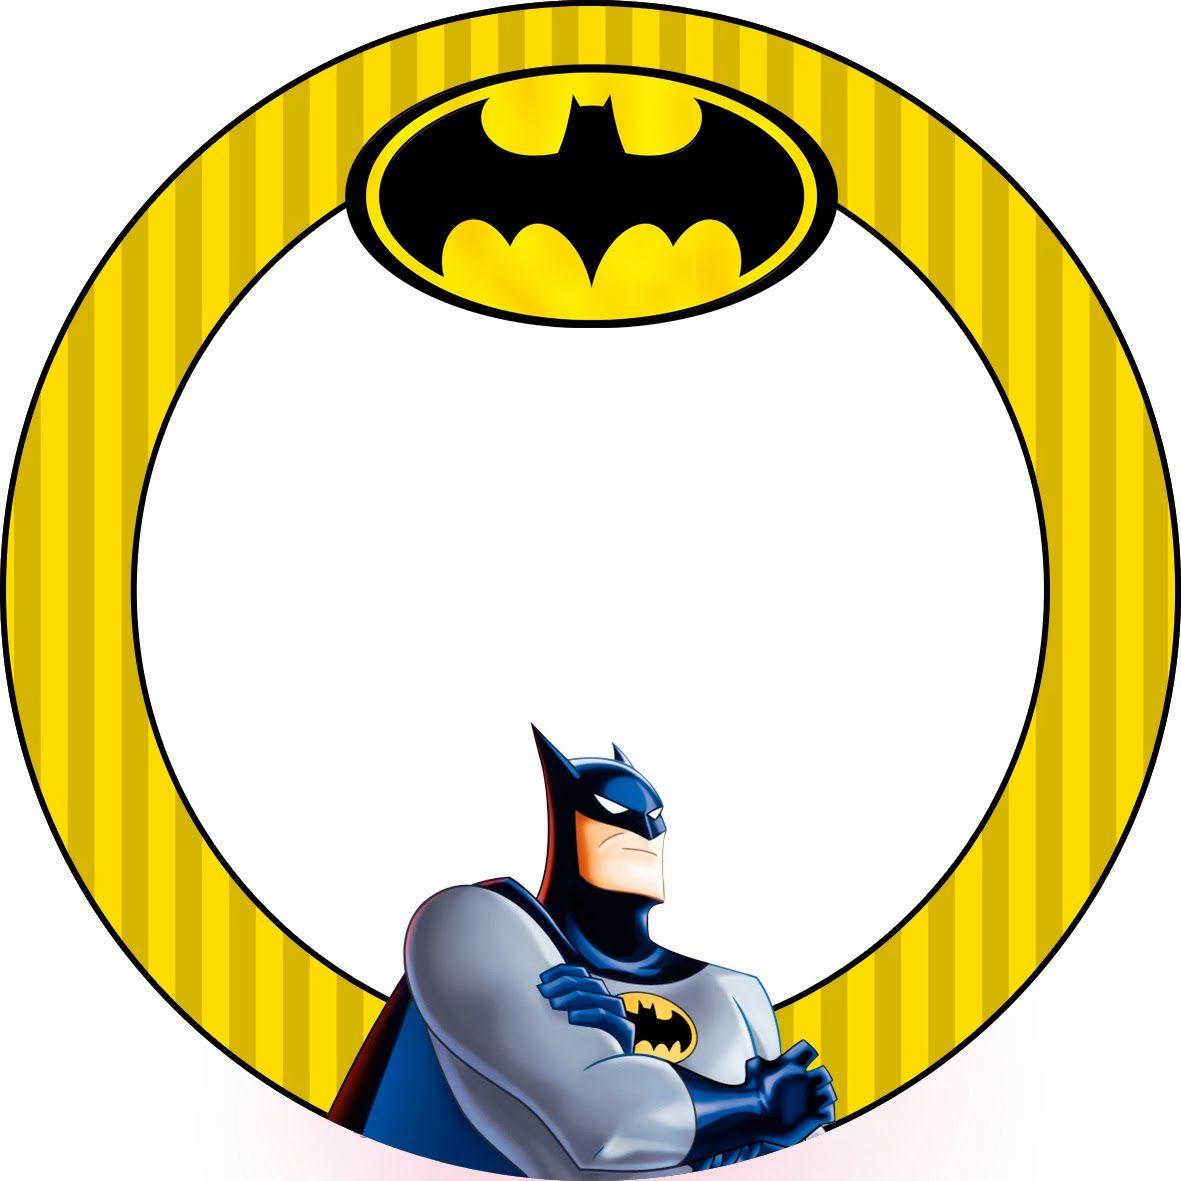 Pin by Peggy Heaton on Batman in 2018 | Pinterest | Batman birthday ...